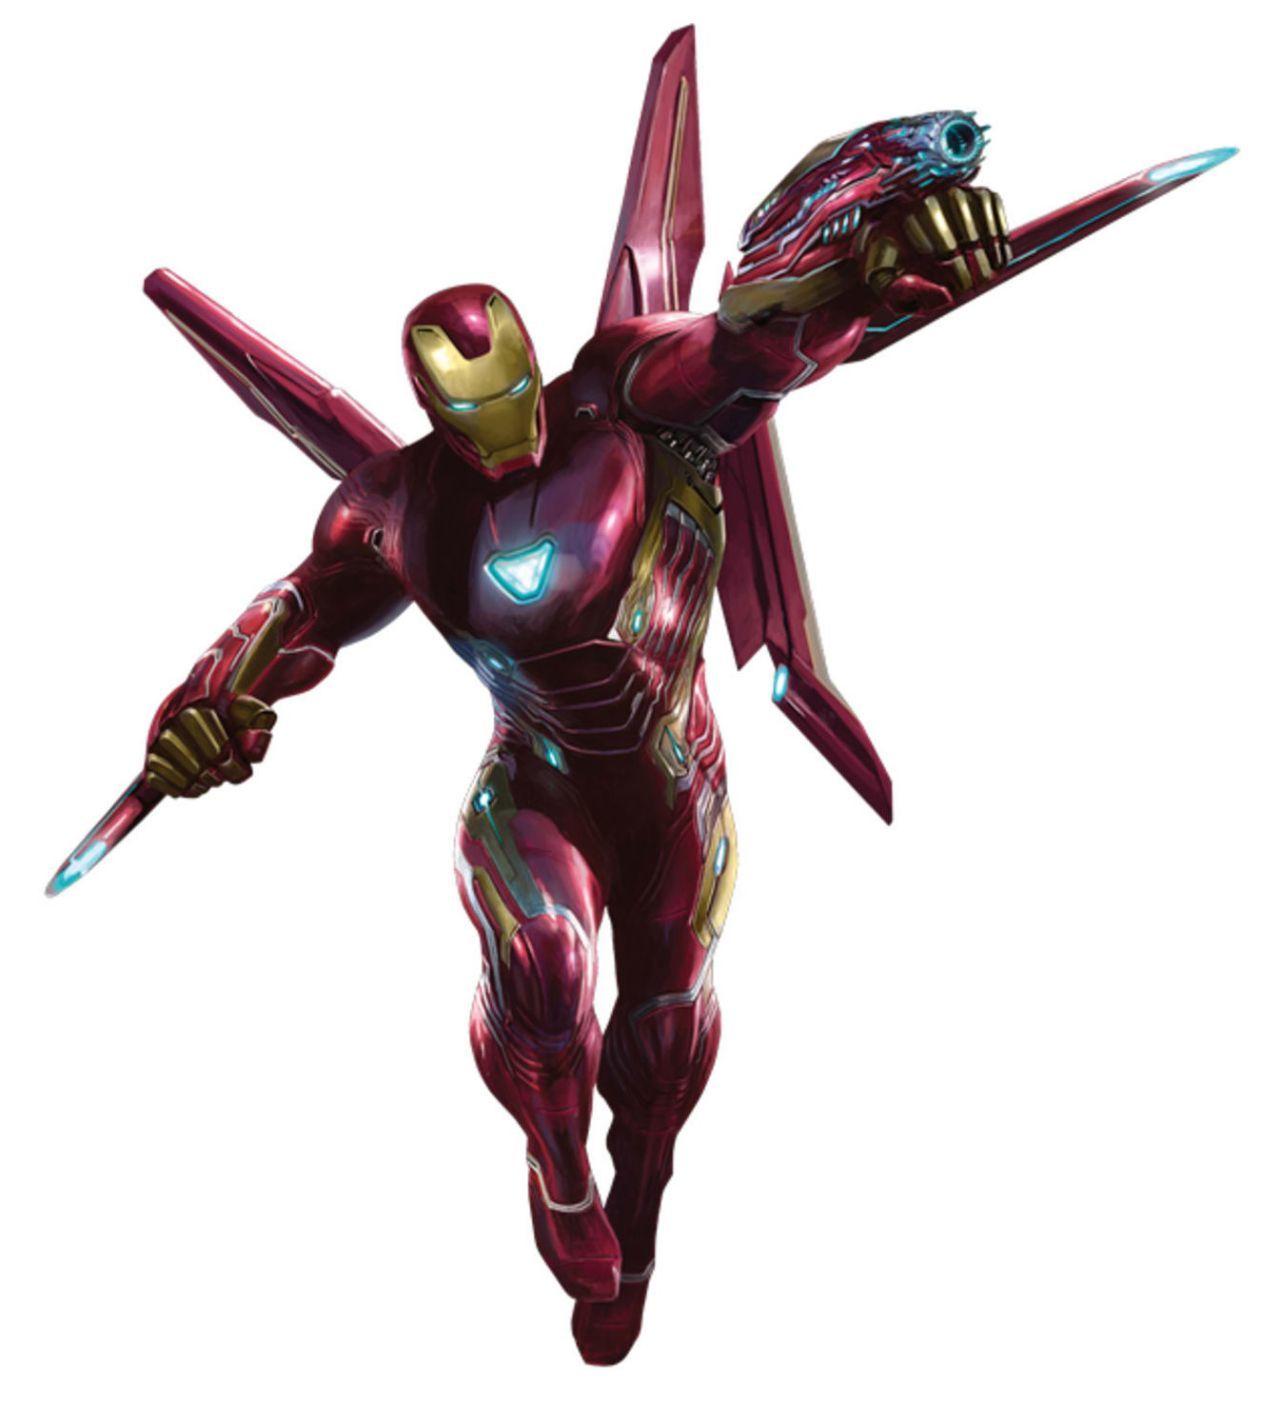 Armor Iron Man Weapons Warfare